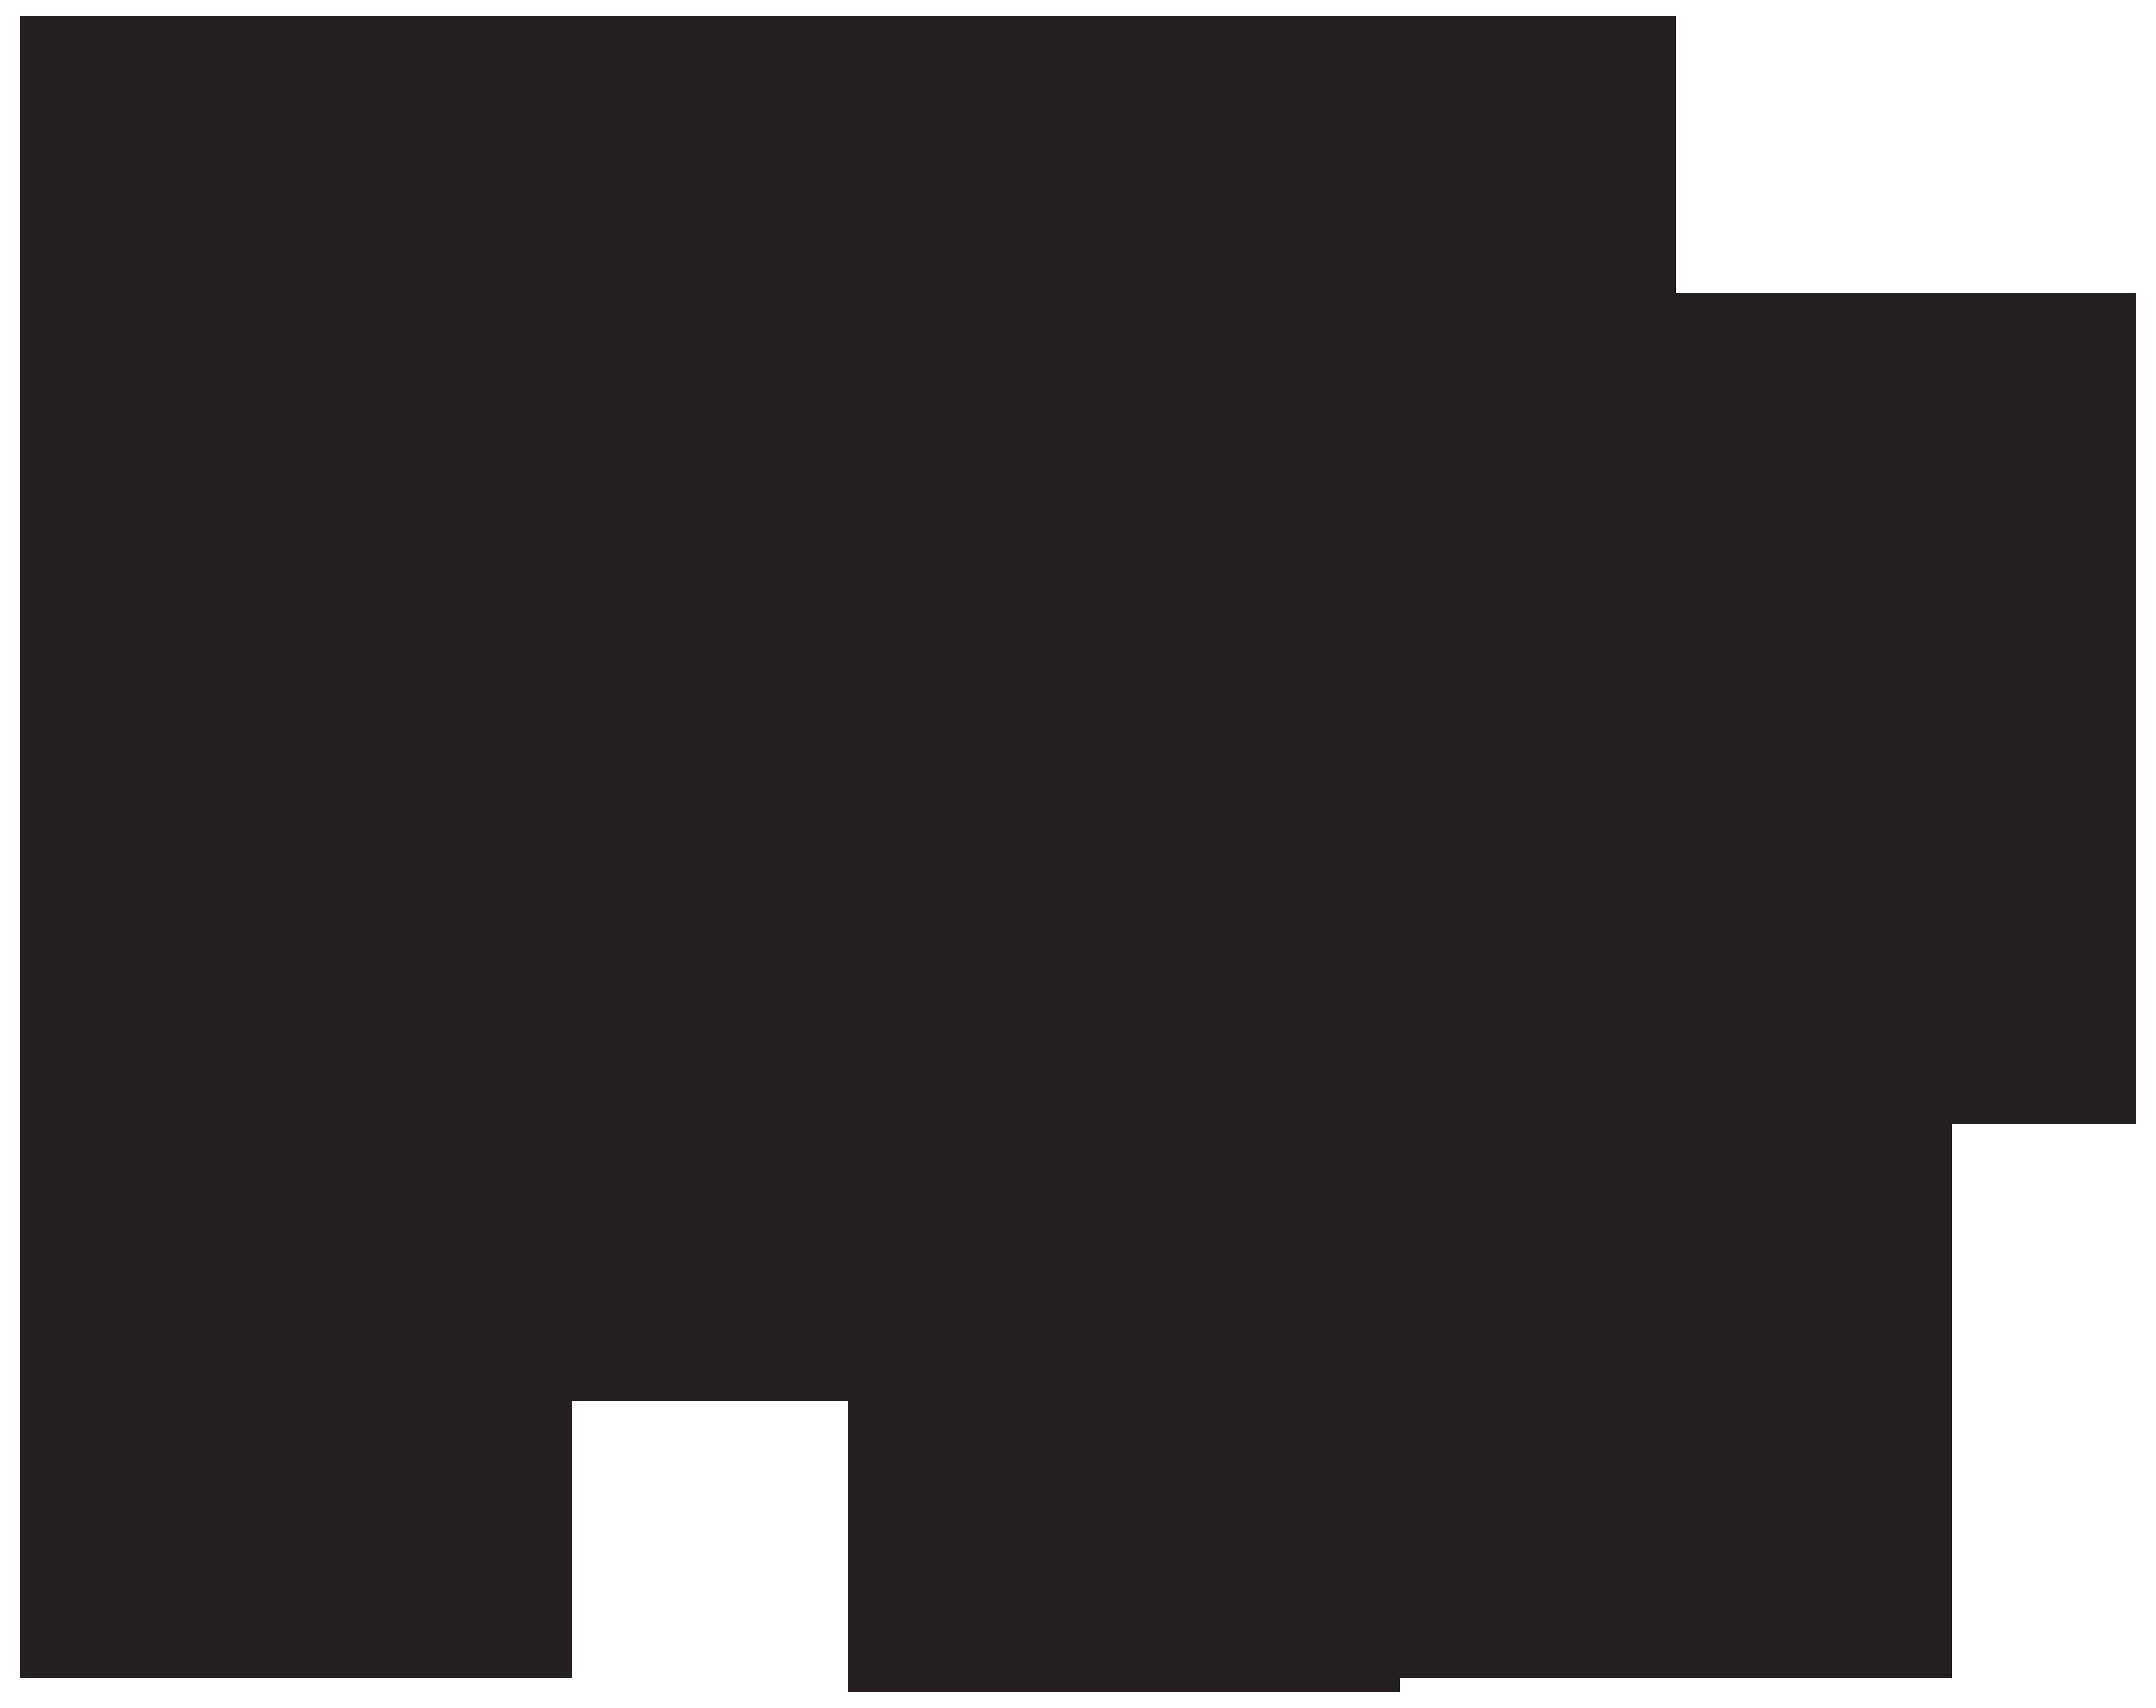 8000x6337 Polar Bear Silhouette Png Clip Art Imageu200b Gallery Yopriceville